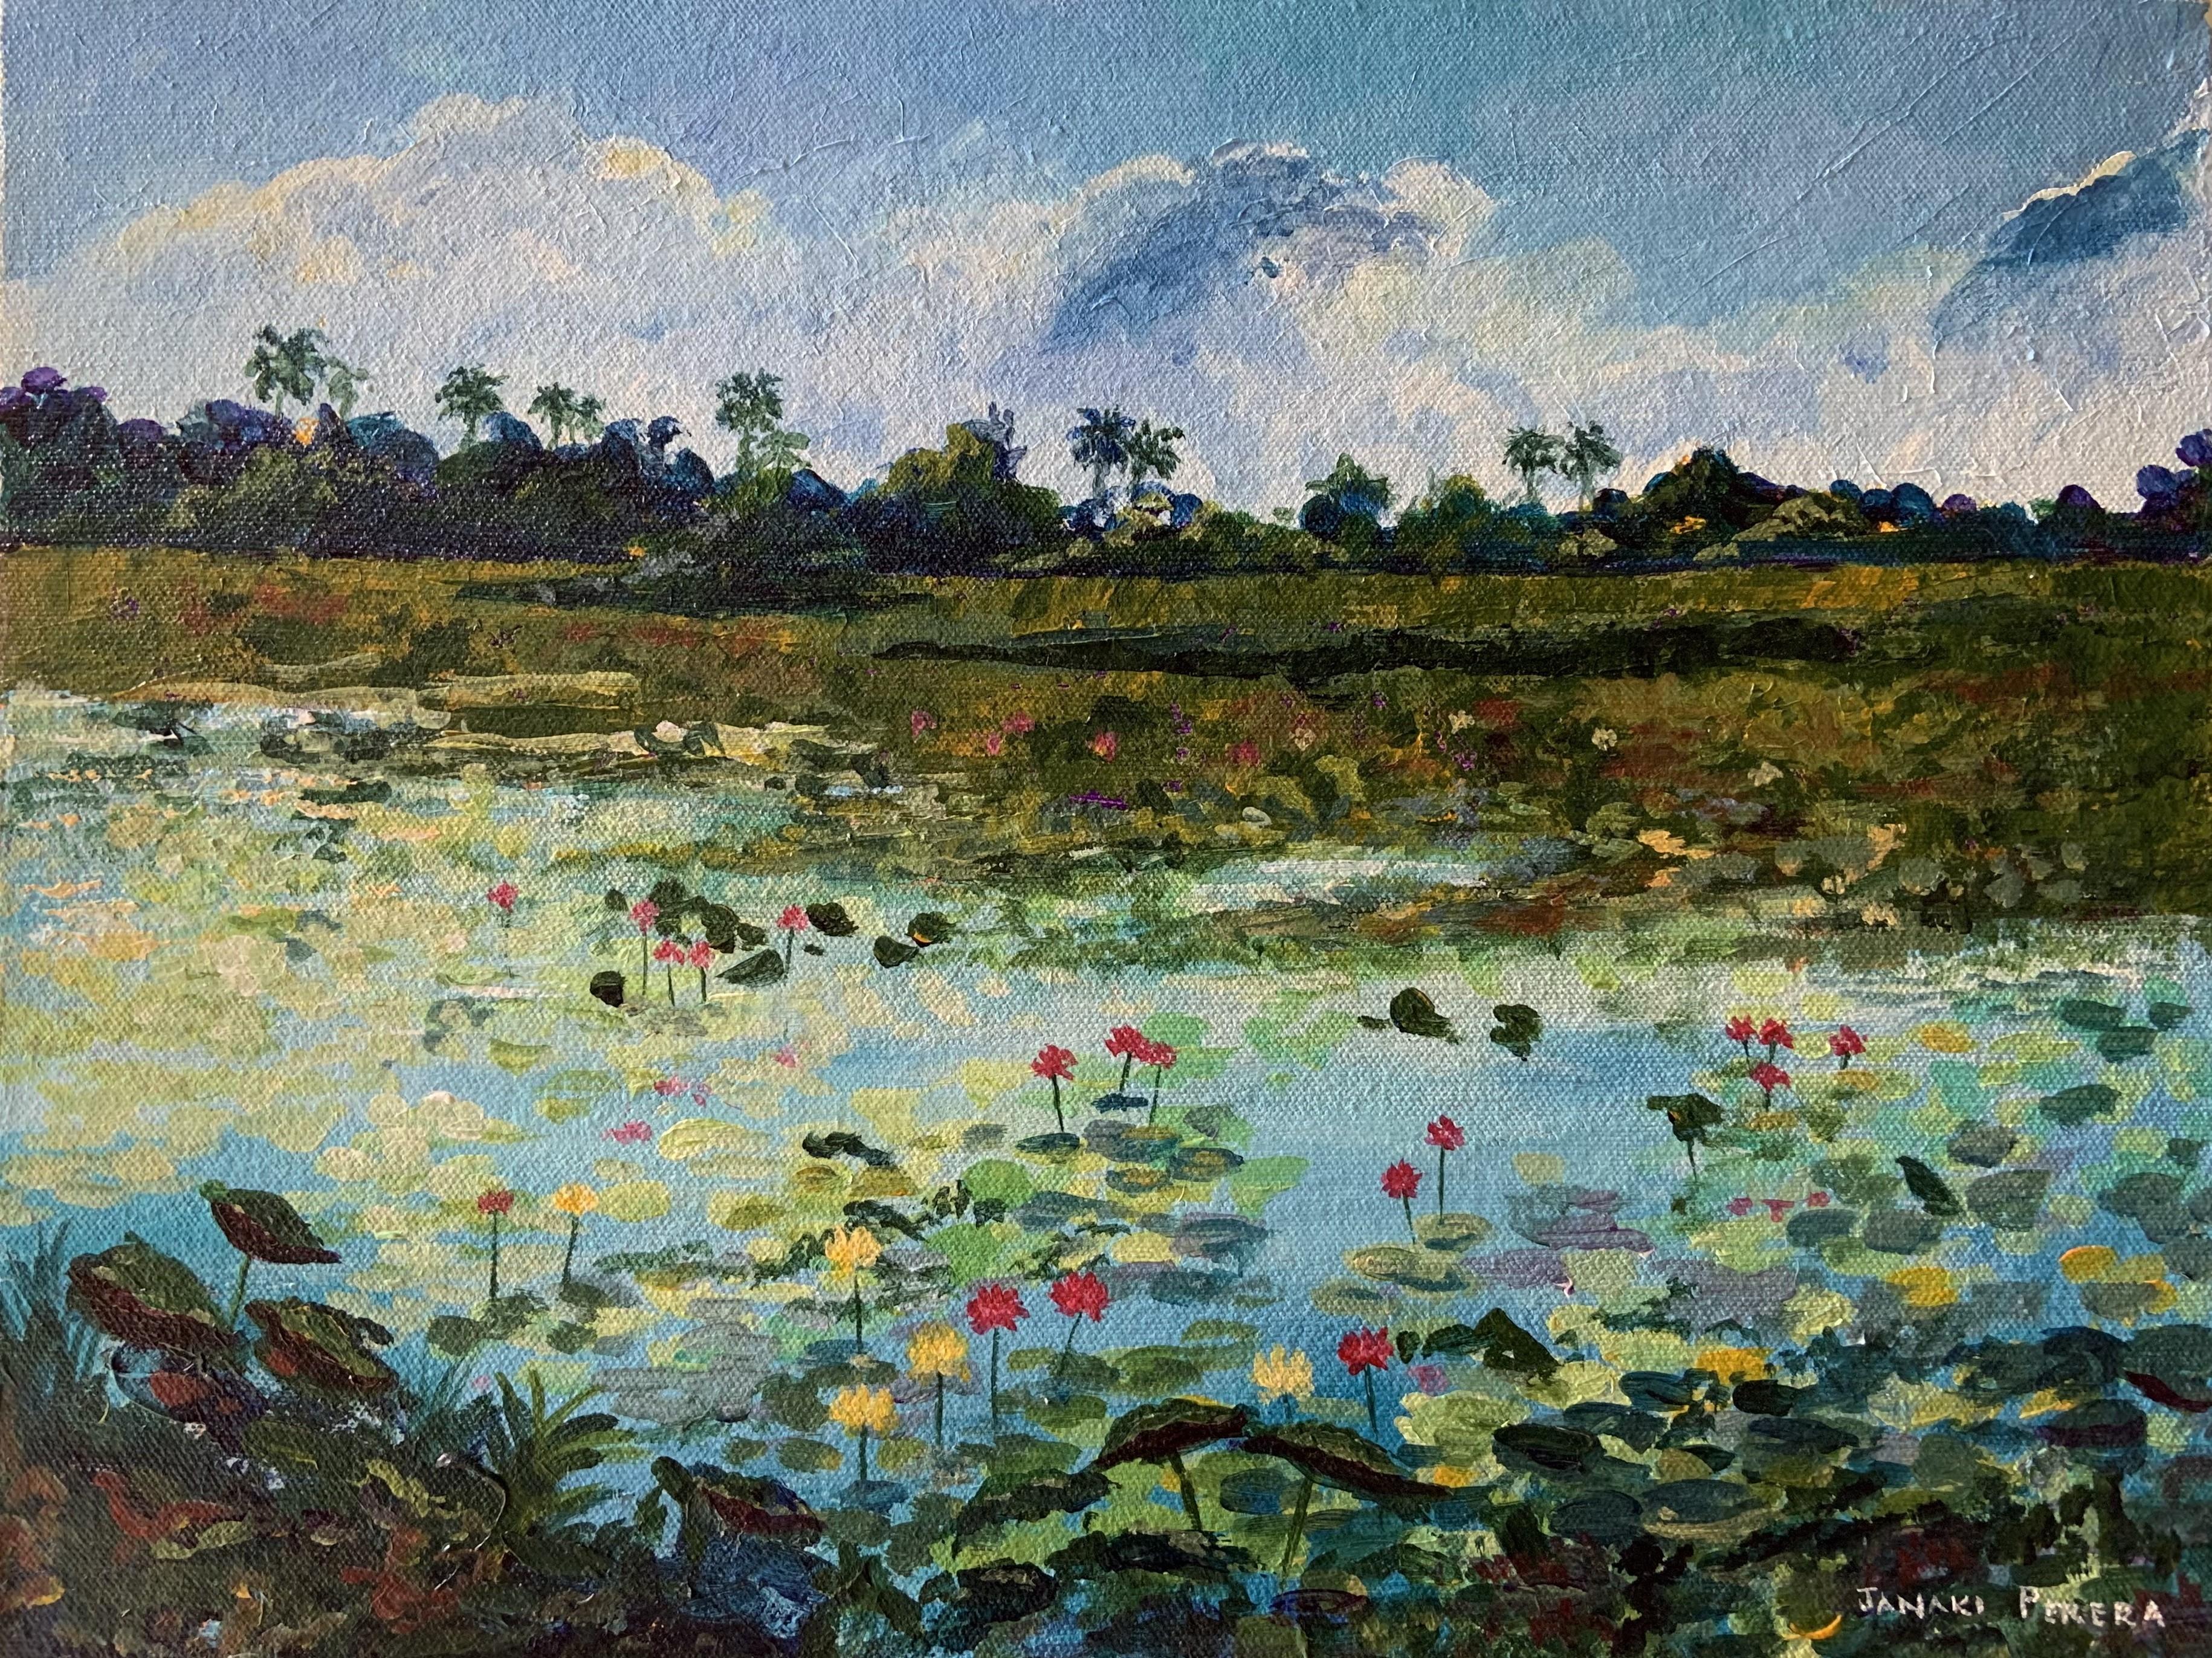 Mannar lake with lotuses by Janaki Perera